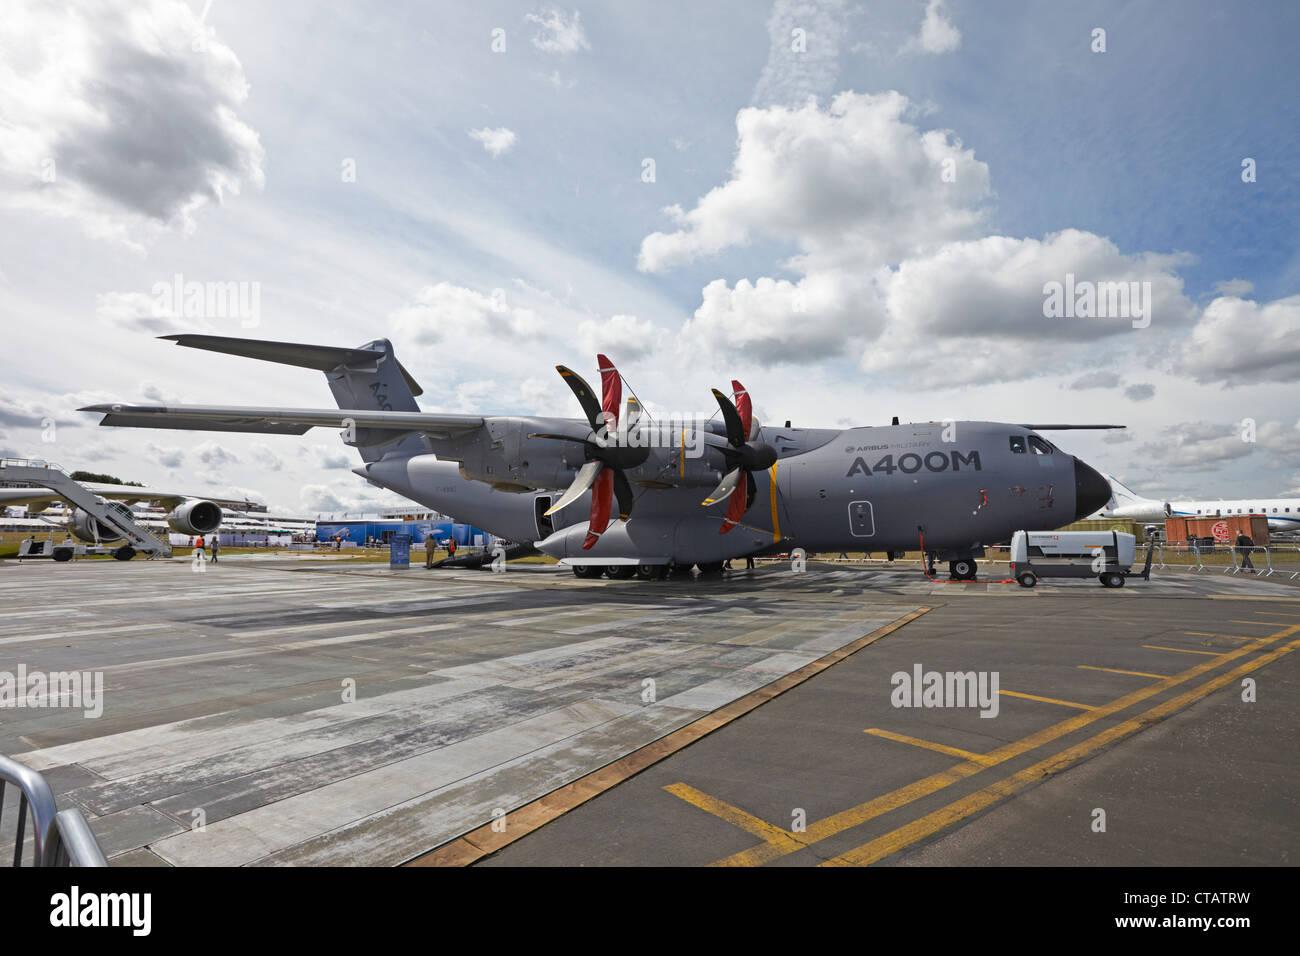 Farnborough International Airshow Airbus Military A400M EADS Atlas - Stock Image